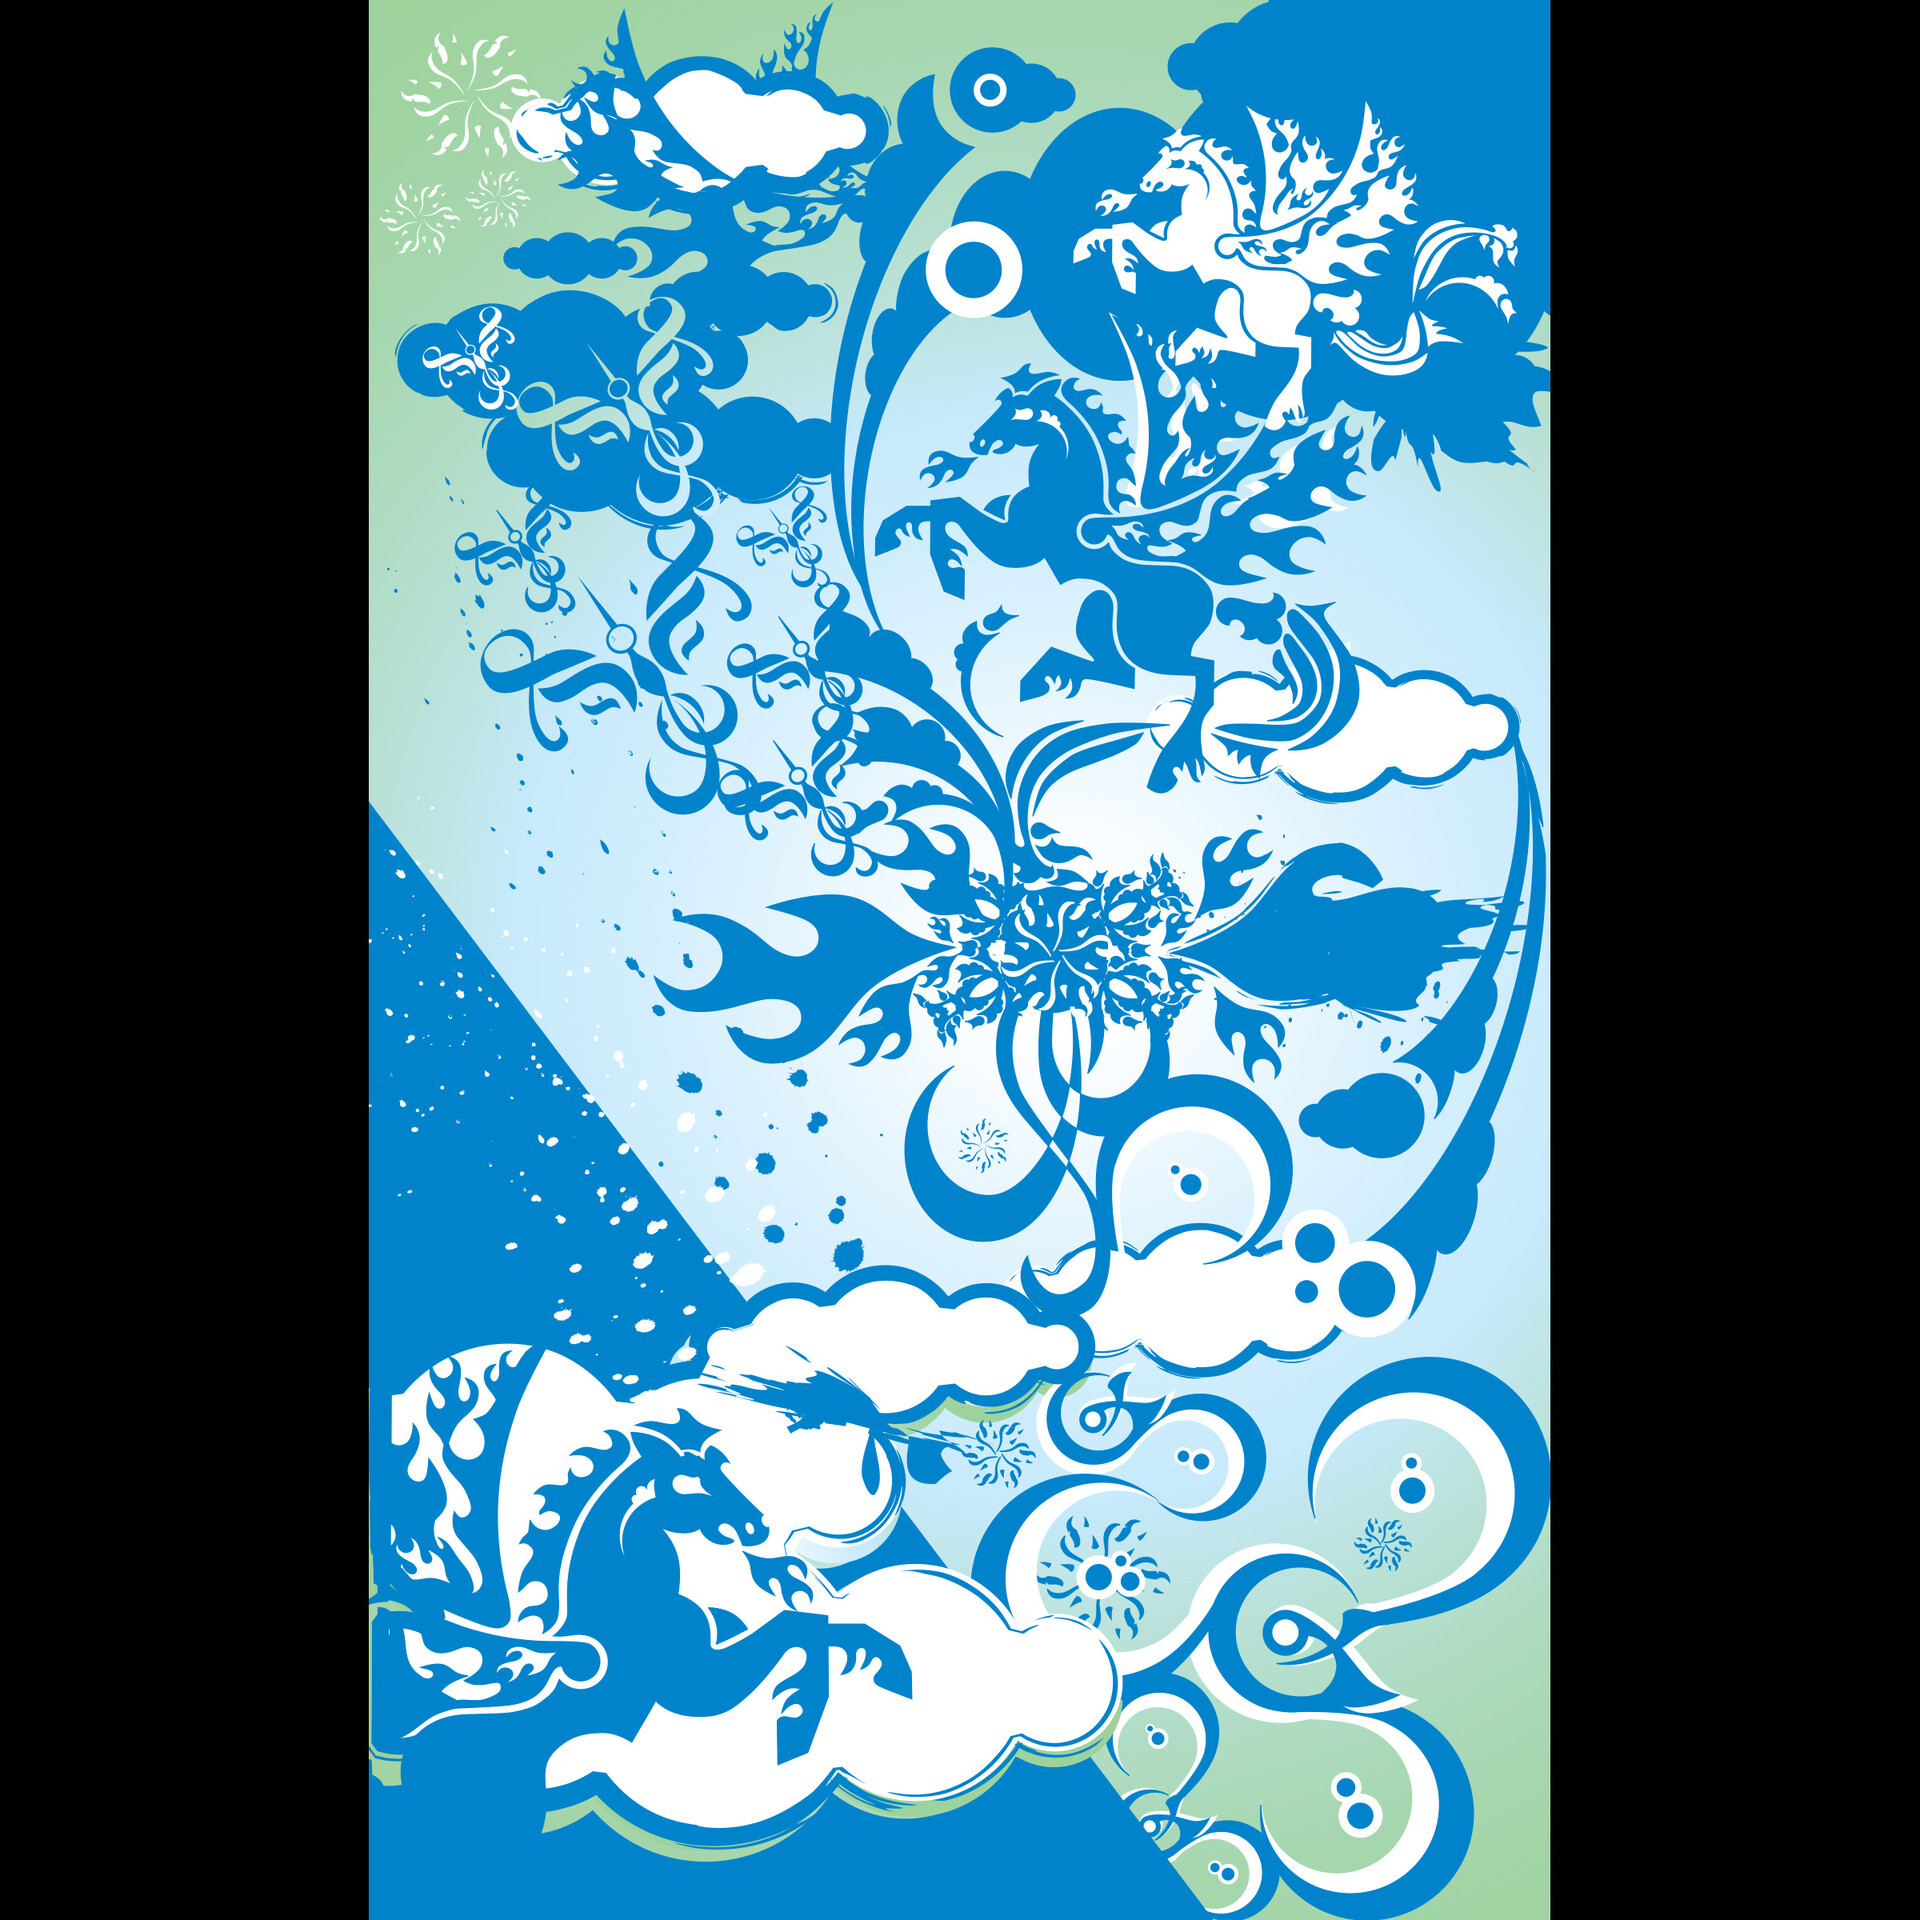 blue illustrator version